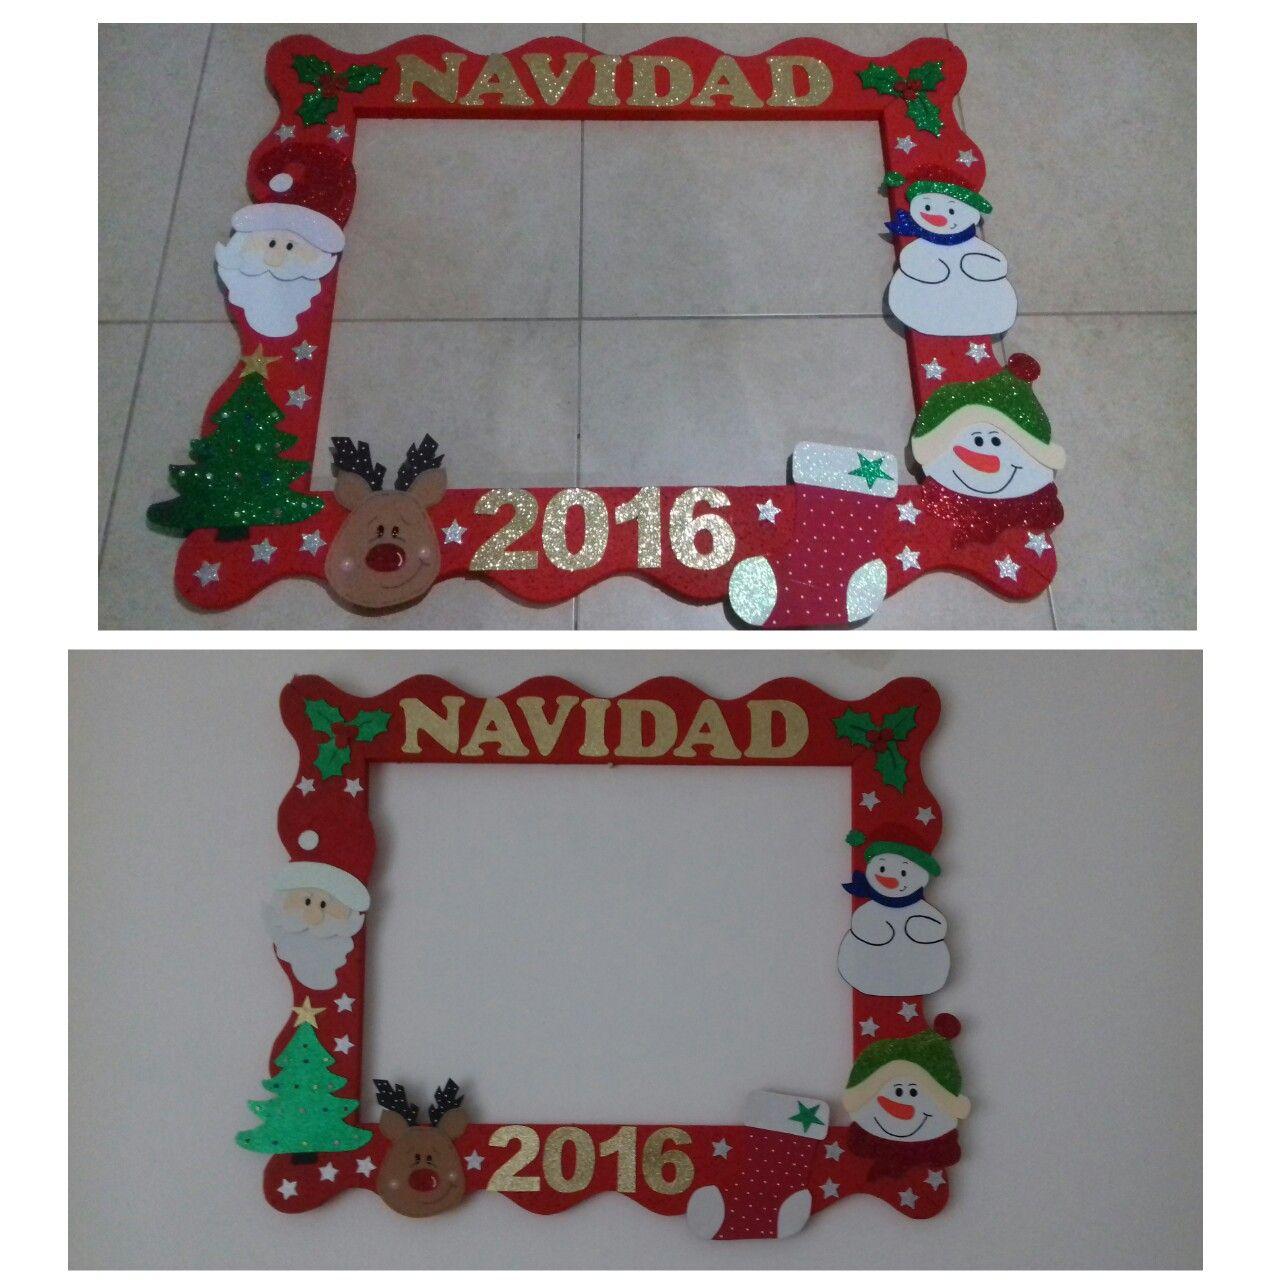 Marco de fotos para Navidad | Photo backdrop | Pinterest | Fotos ...